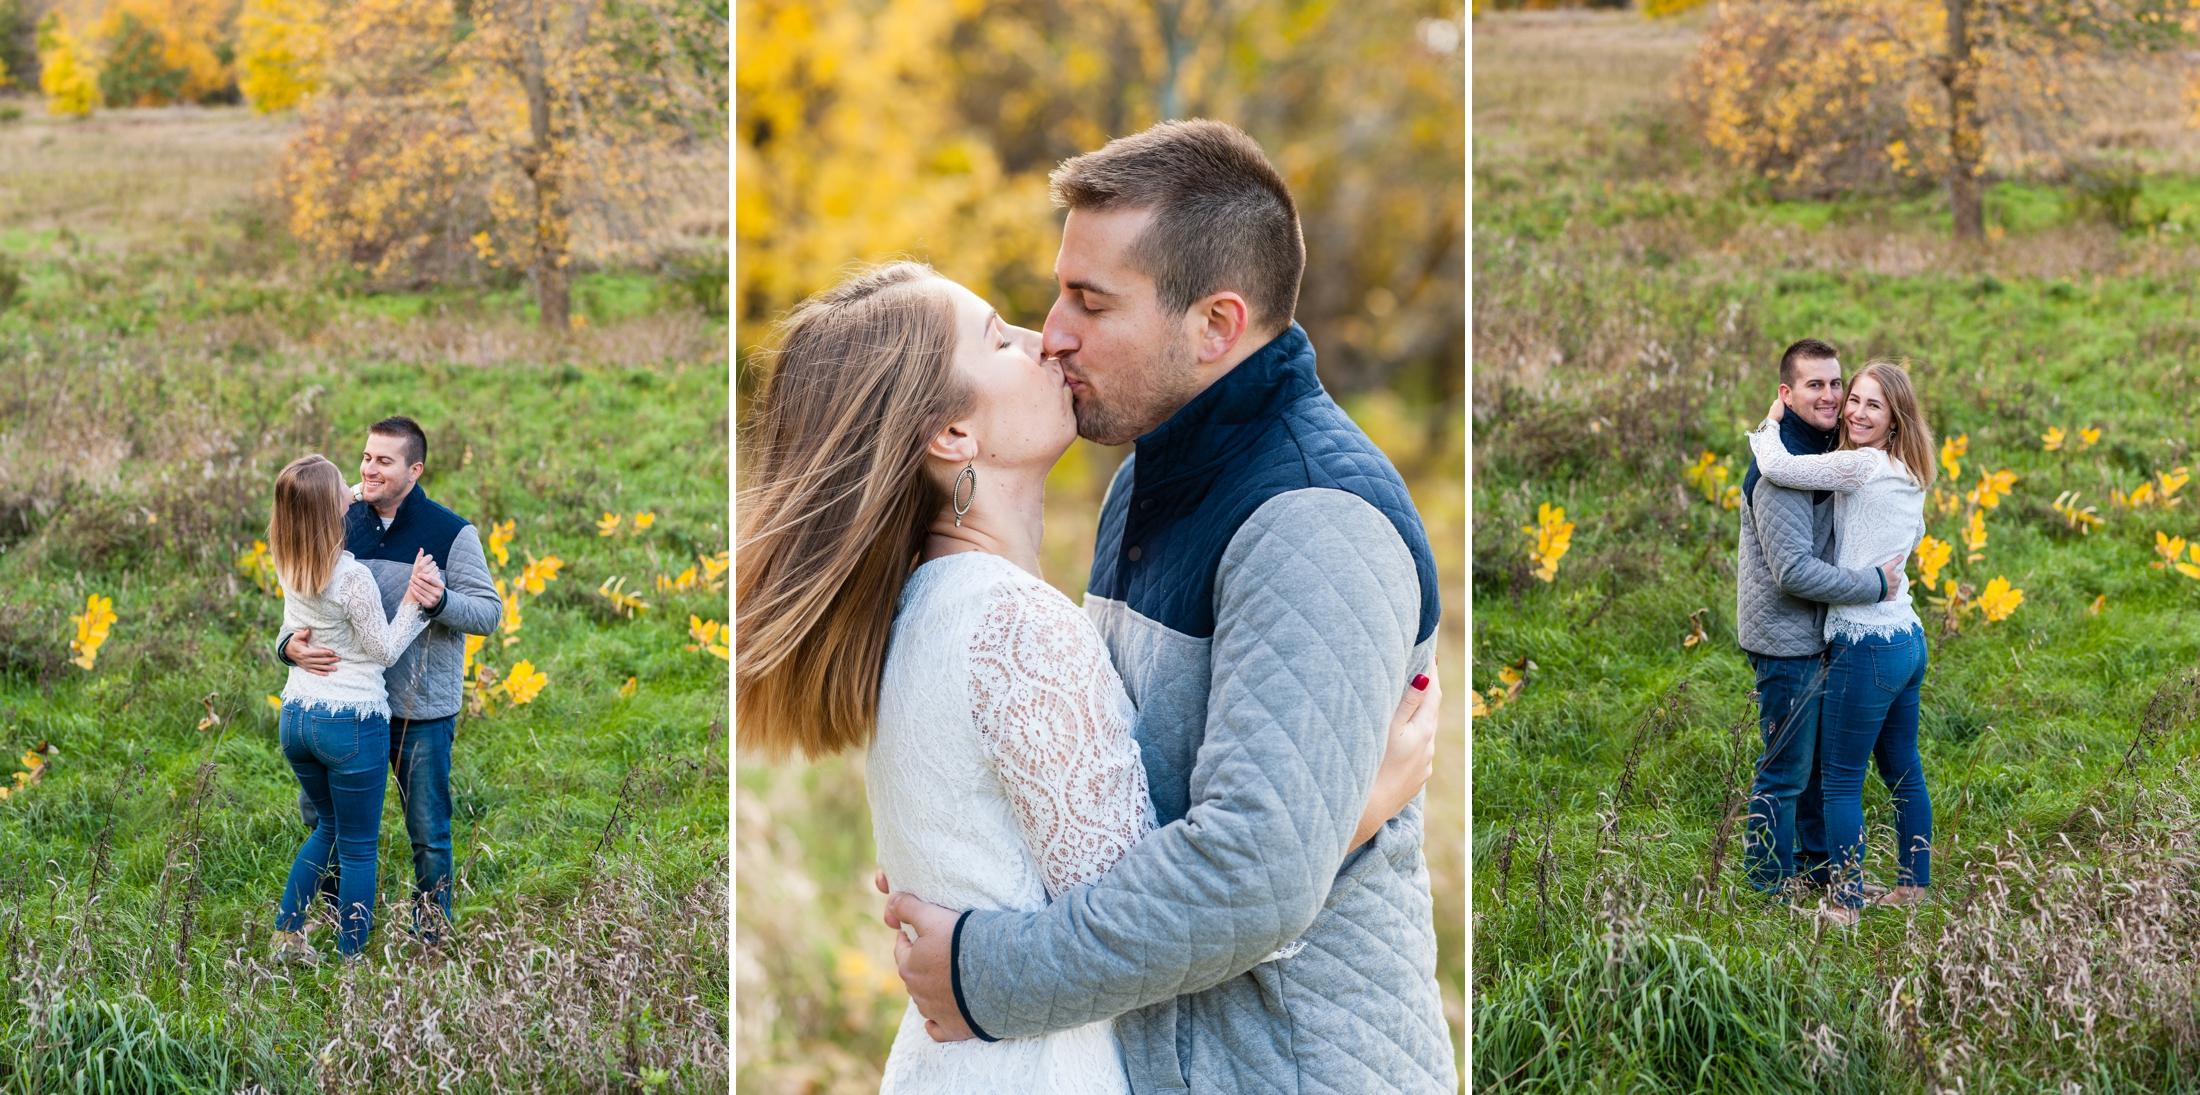 best-wisconsin-wedding-photographer-engagement-session-7.jpg